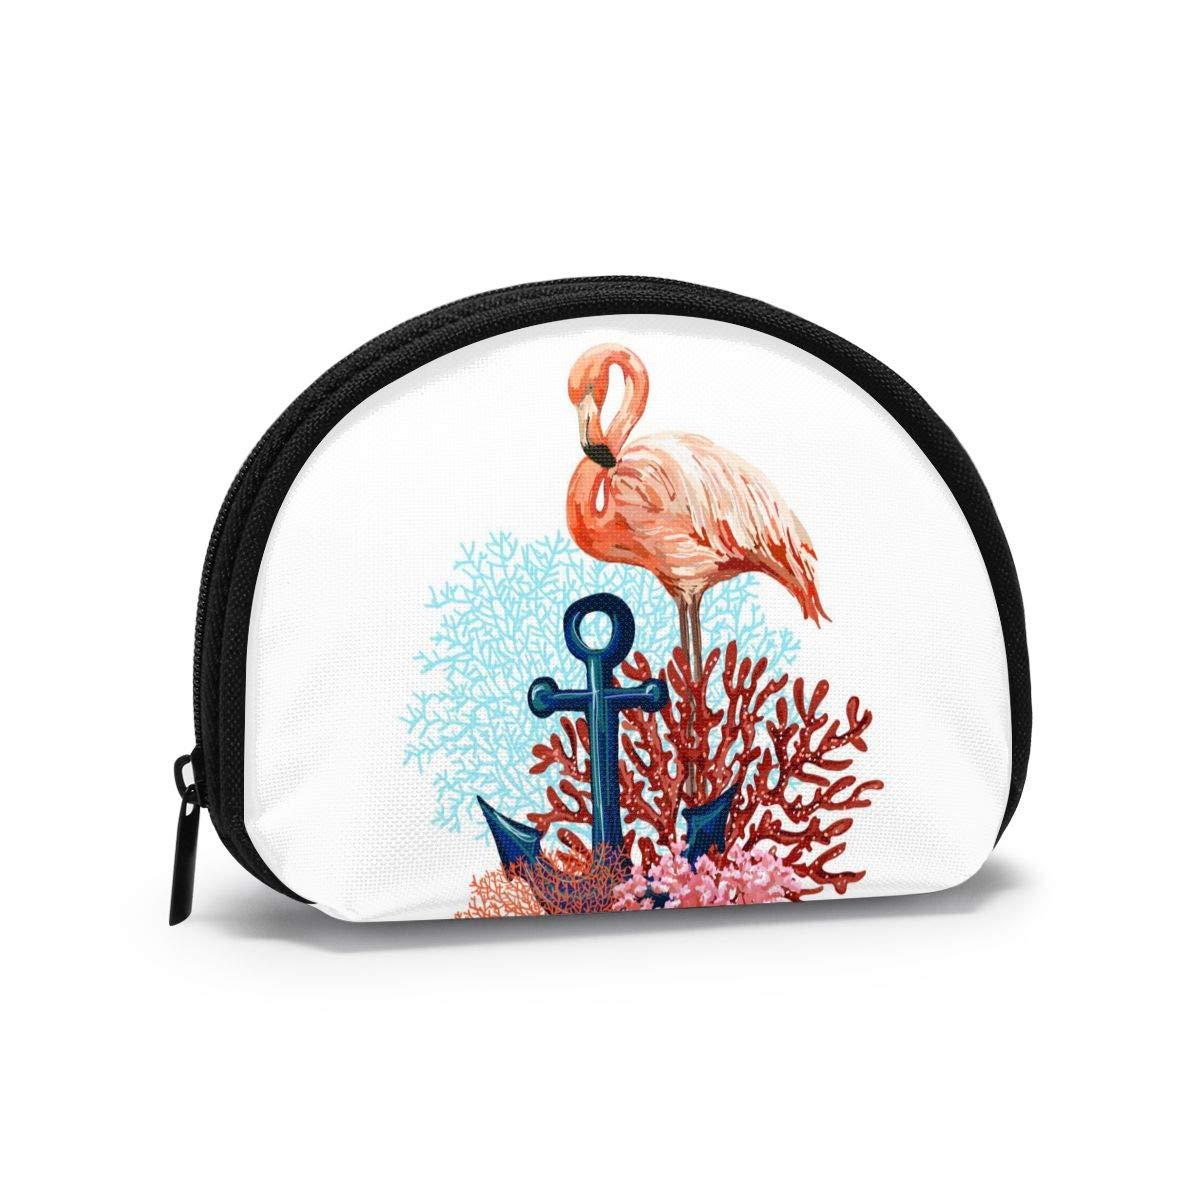 Tropical Flamingo With Anchor Semicircular Mini Wallet Coin Purse Card Holder Bag